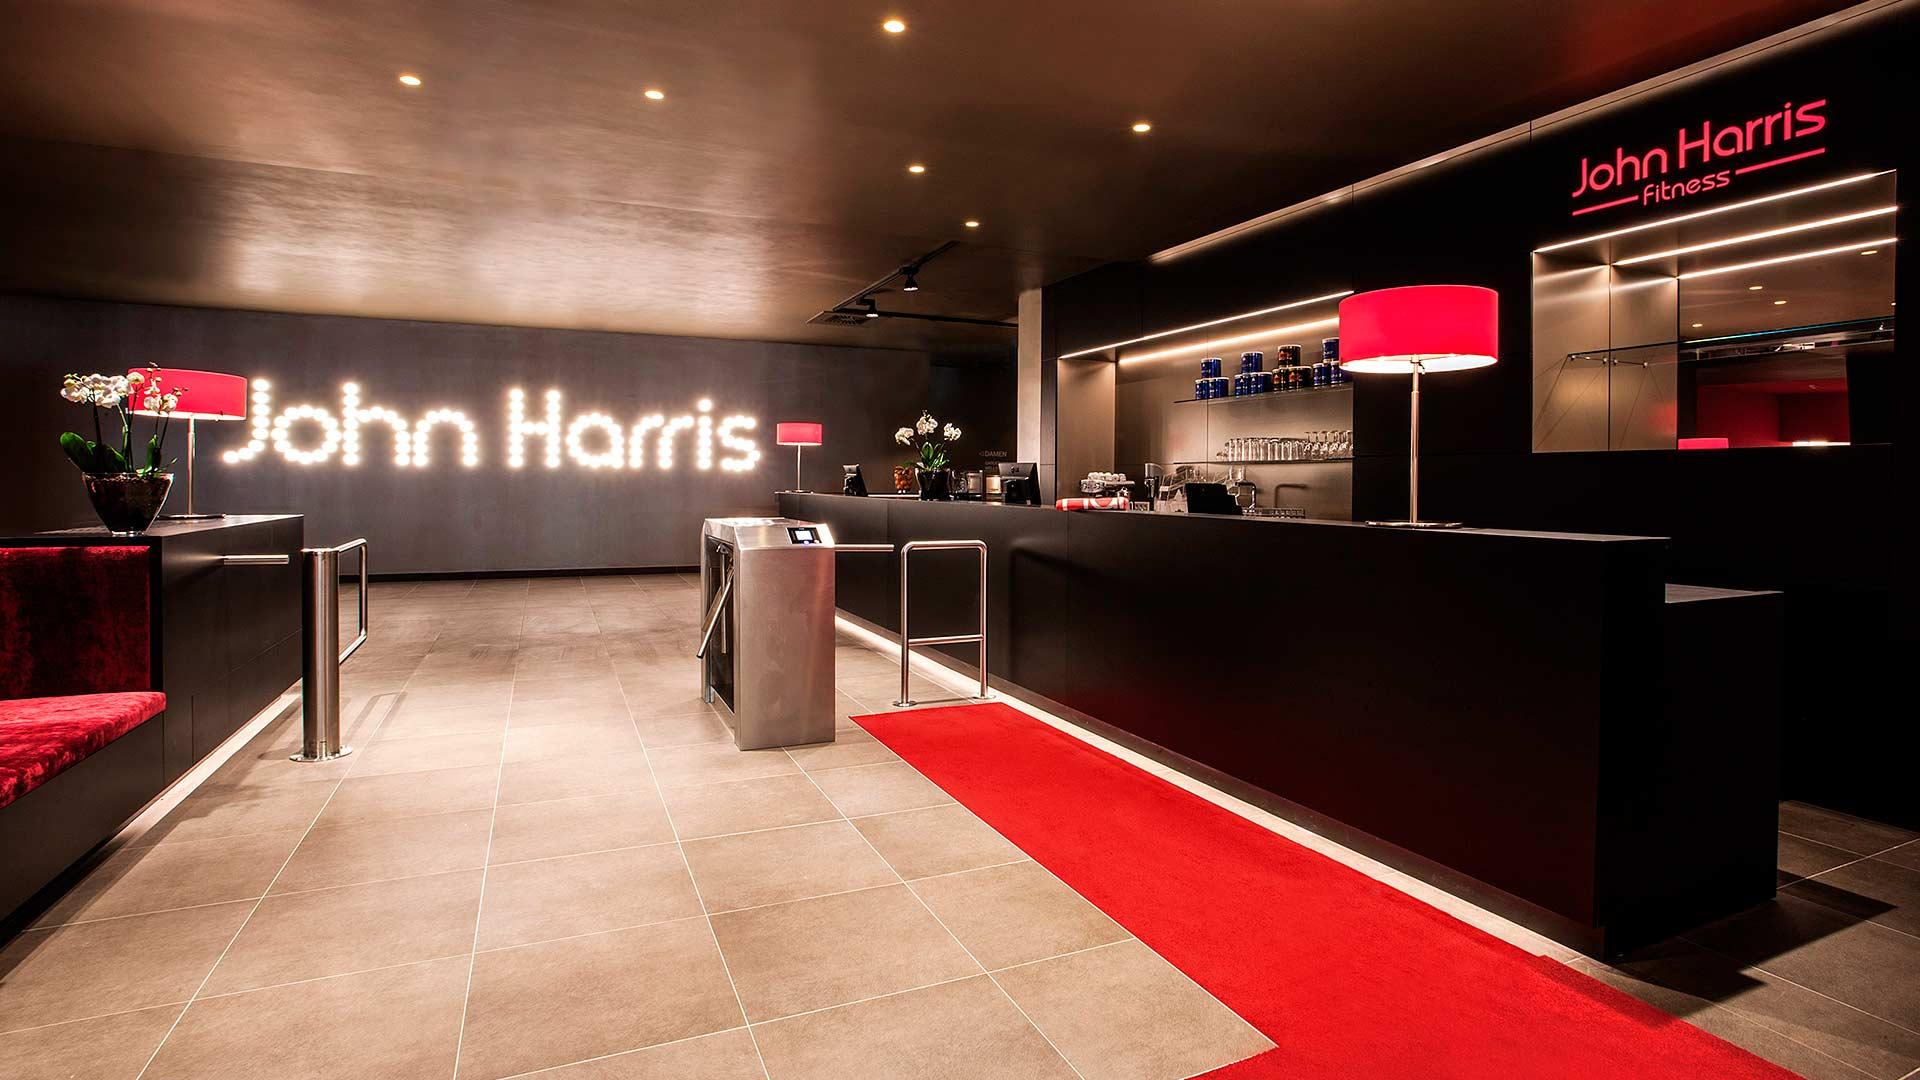 John Harris Fitnessstudio Neueröffnung 1100 Hauptbahnhof